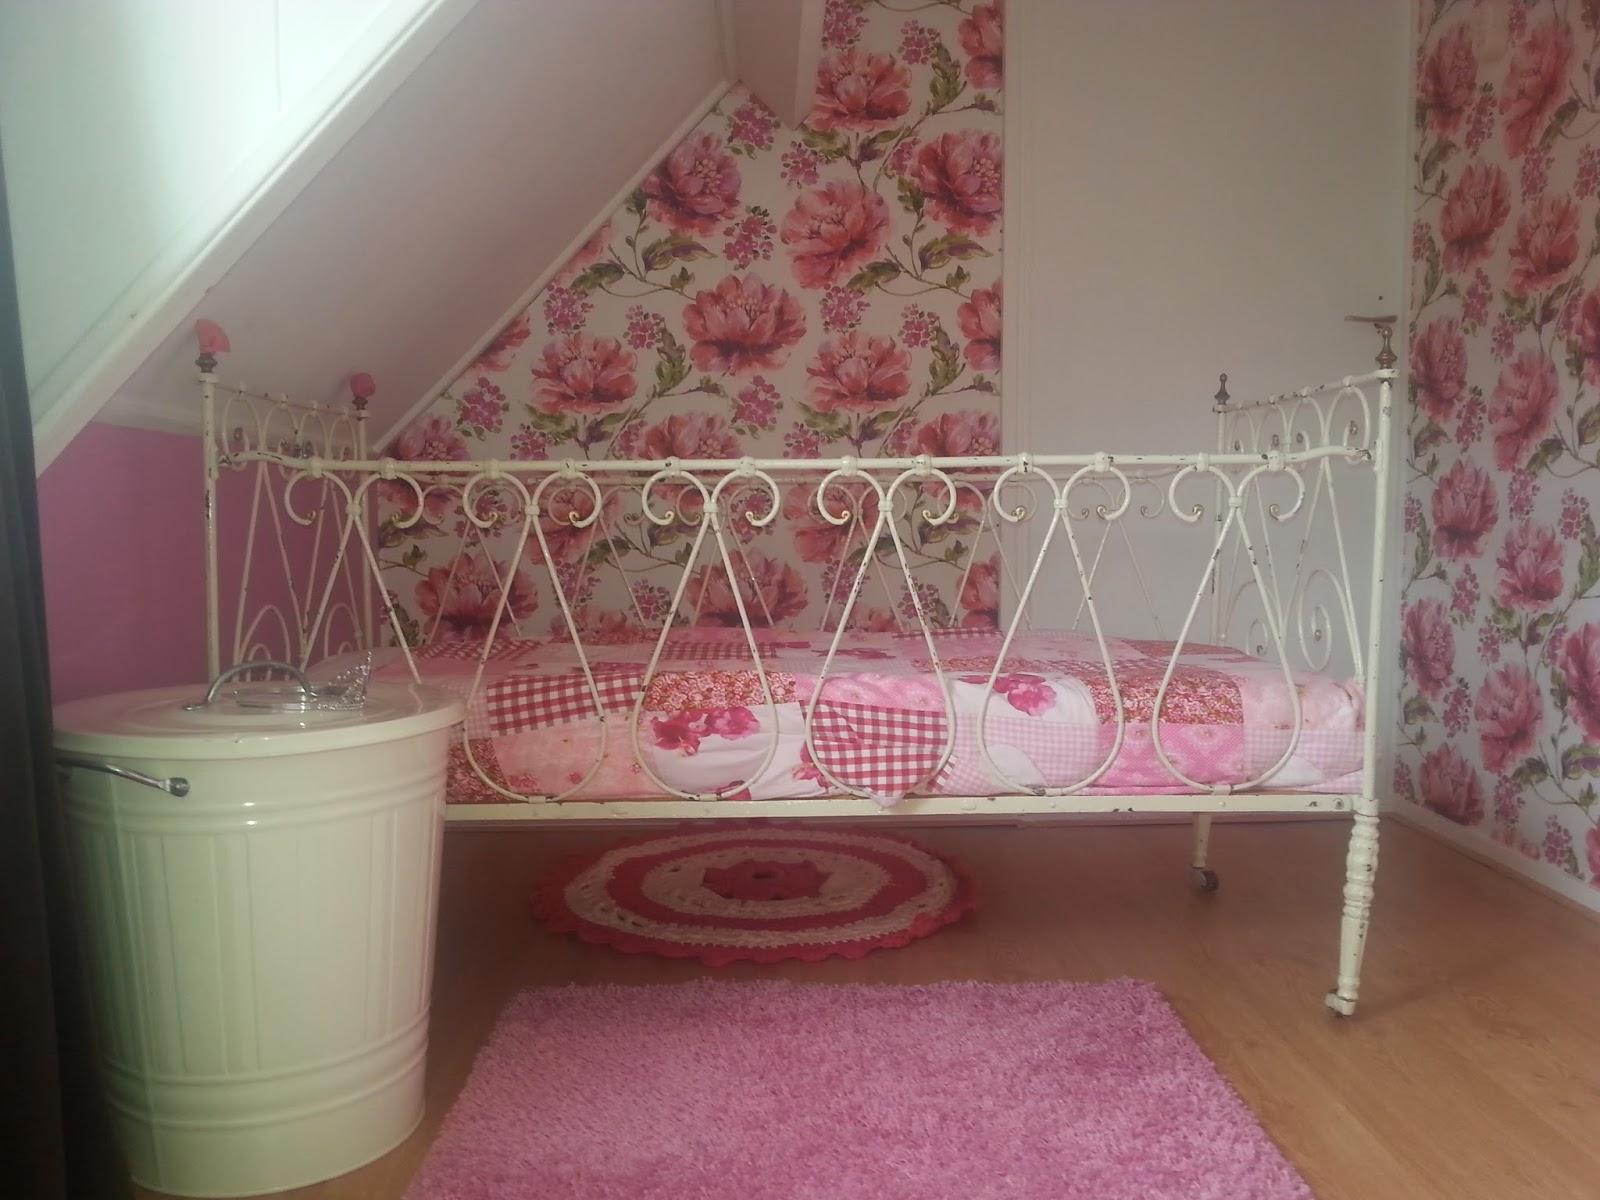 Vanaf de Dorpsstraat: Project roze kamer